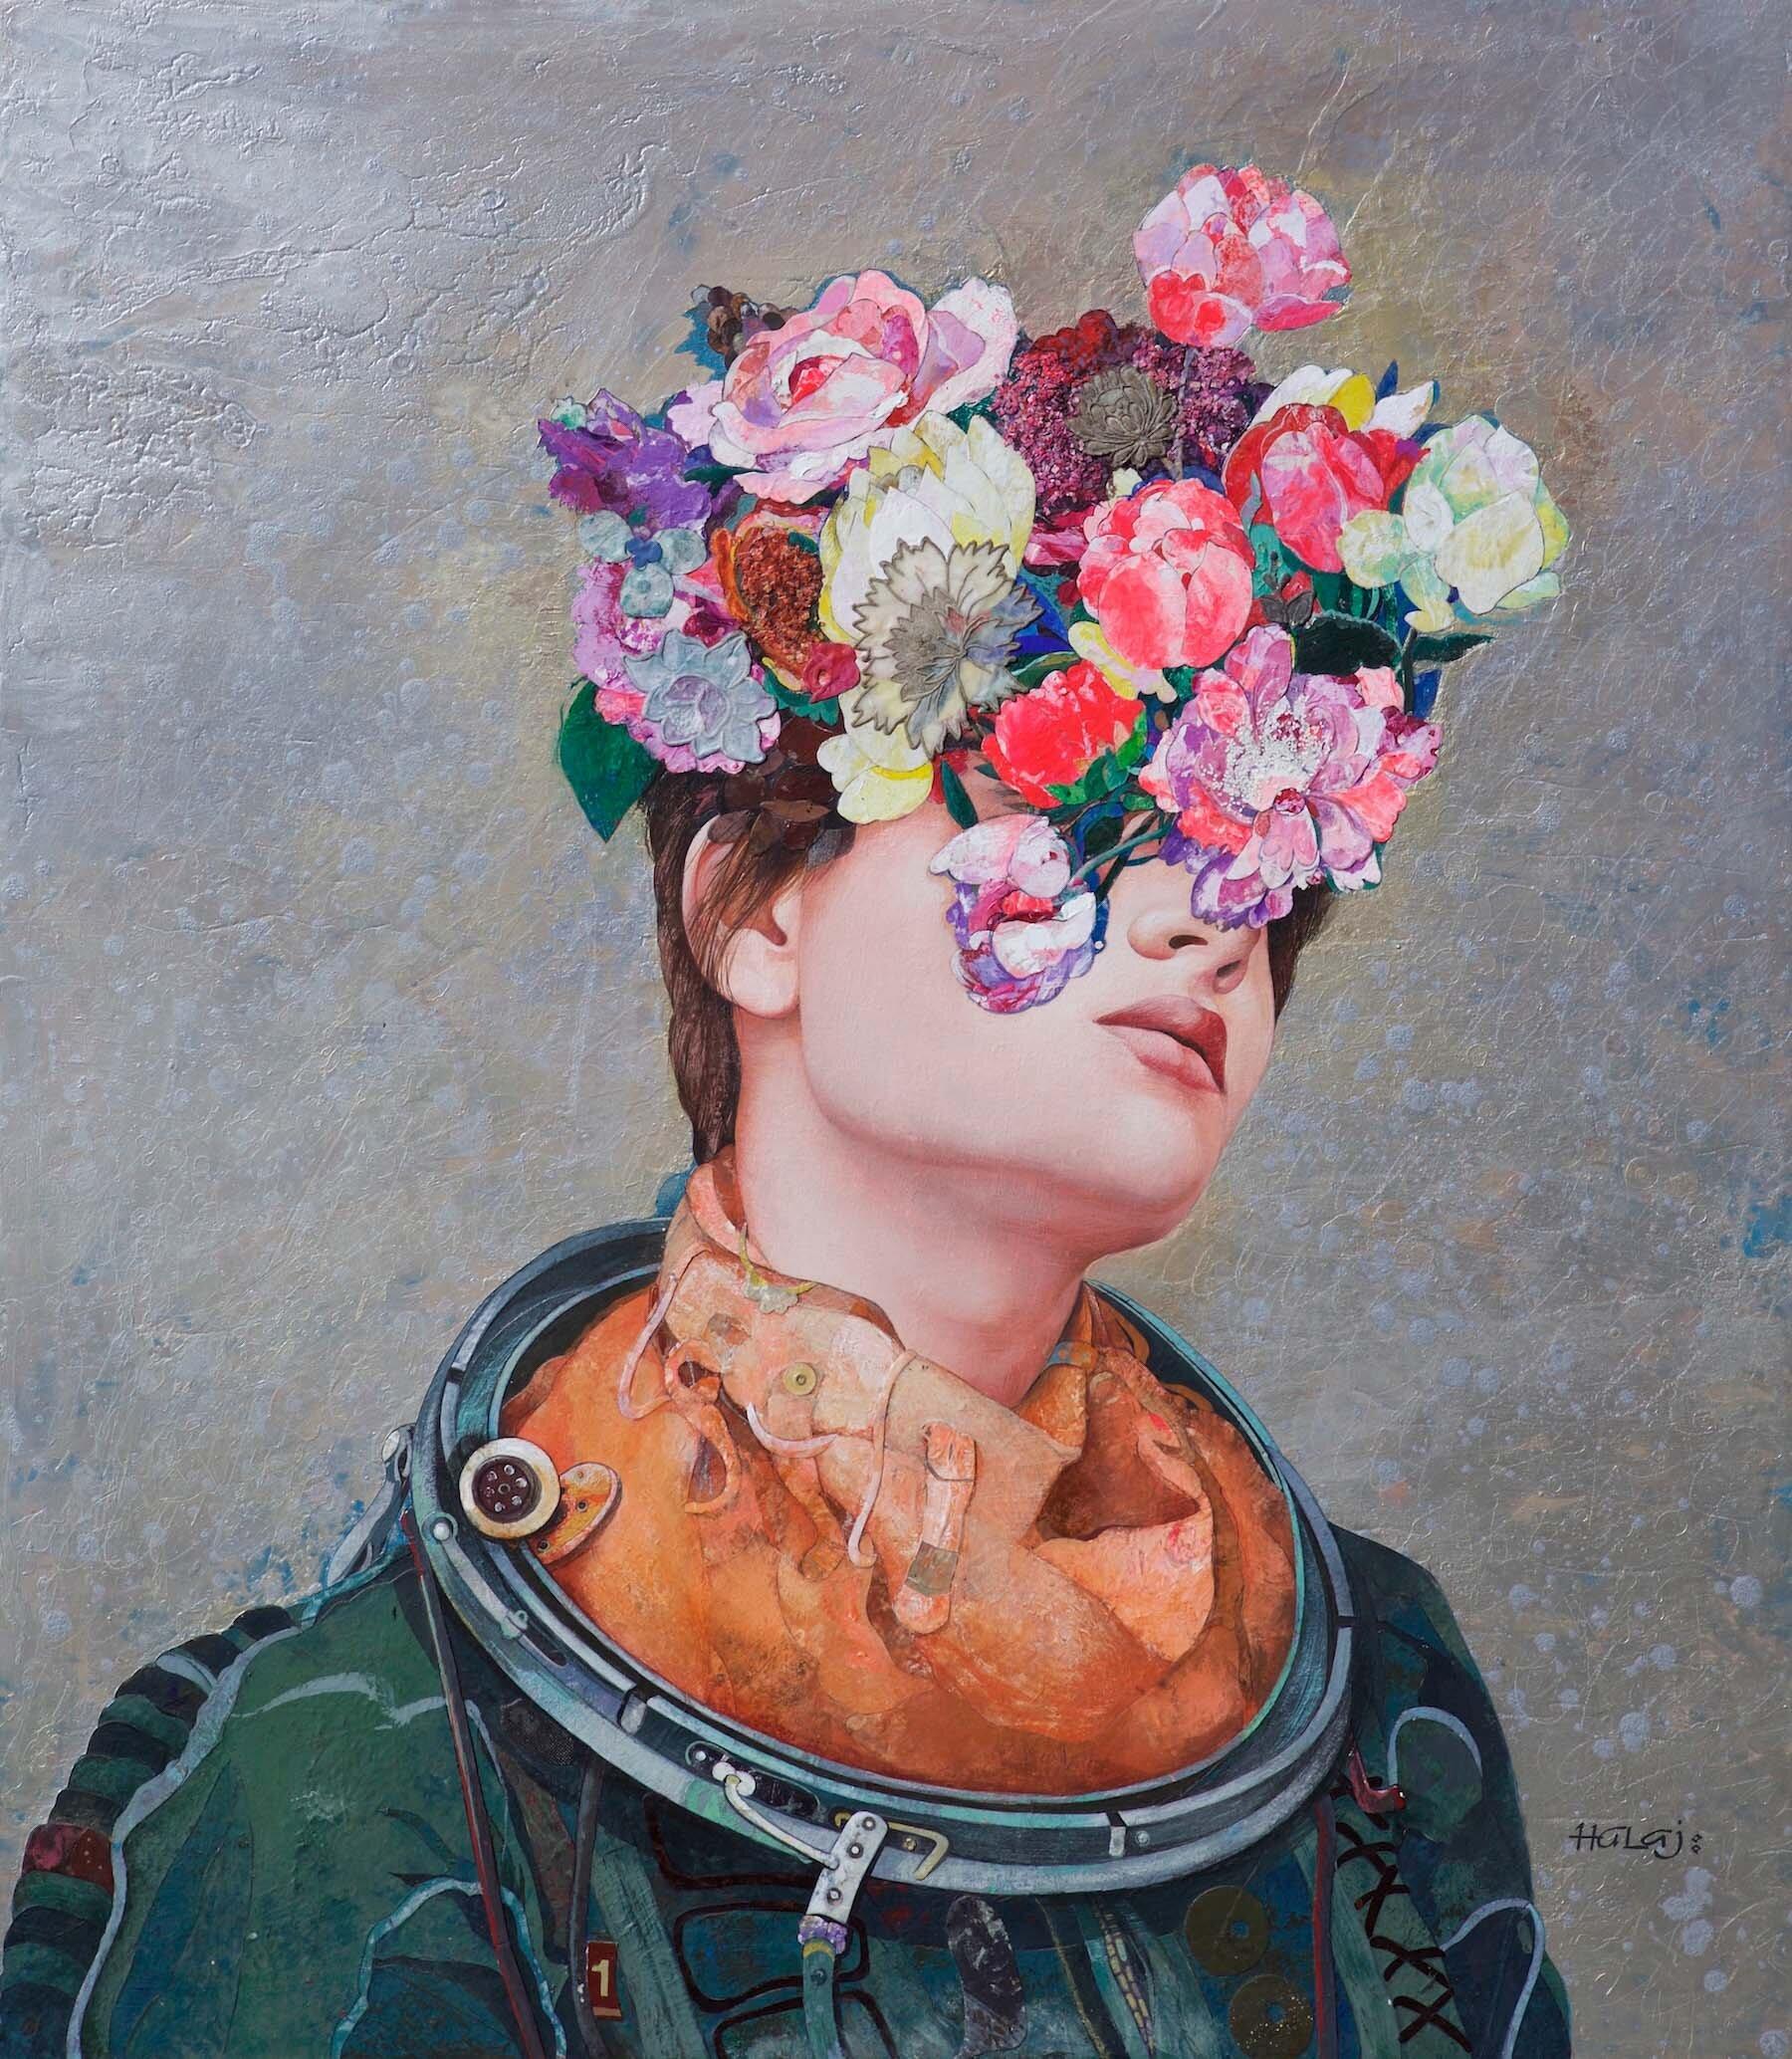 Minas Halaj %22 Floral Mind # 40 %22 2017, Oil, wax, textile, mixed media on panel, 42x48 in. (106.68x121.92 cm.).jpg